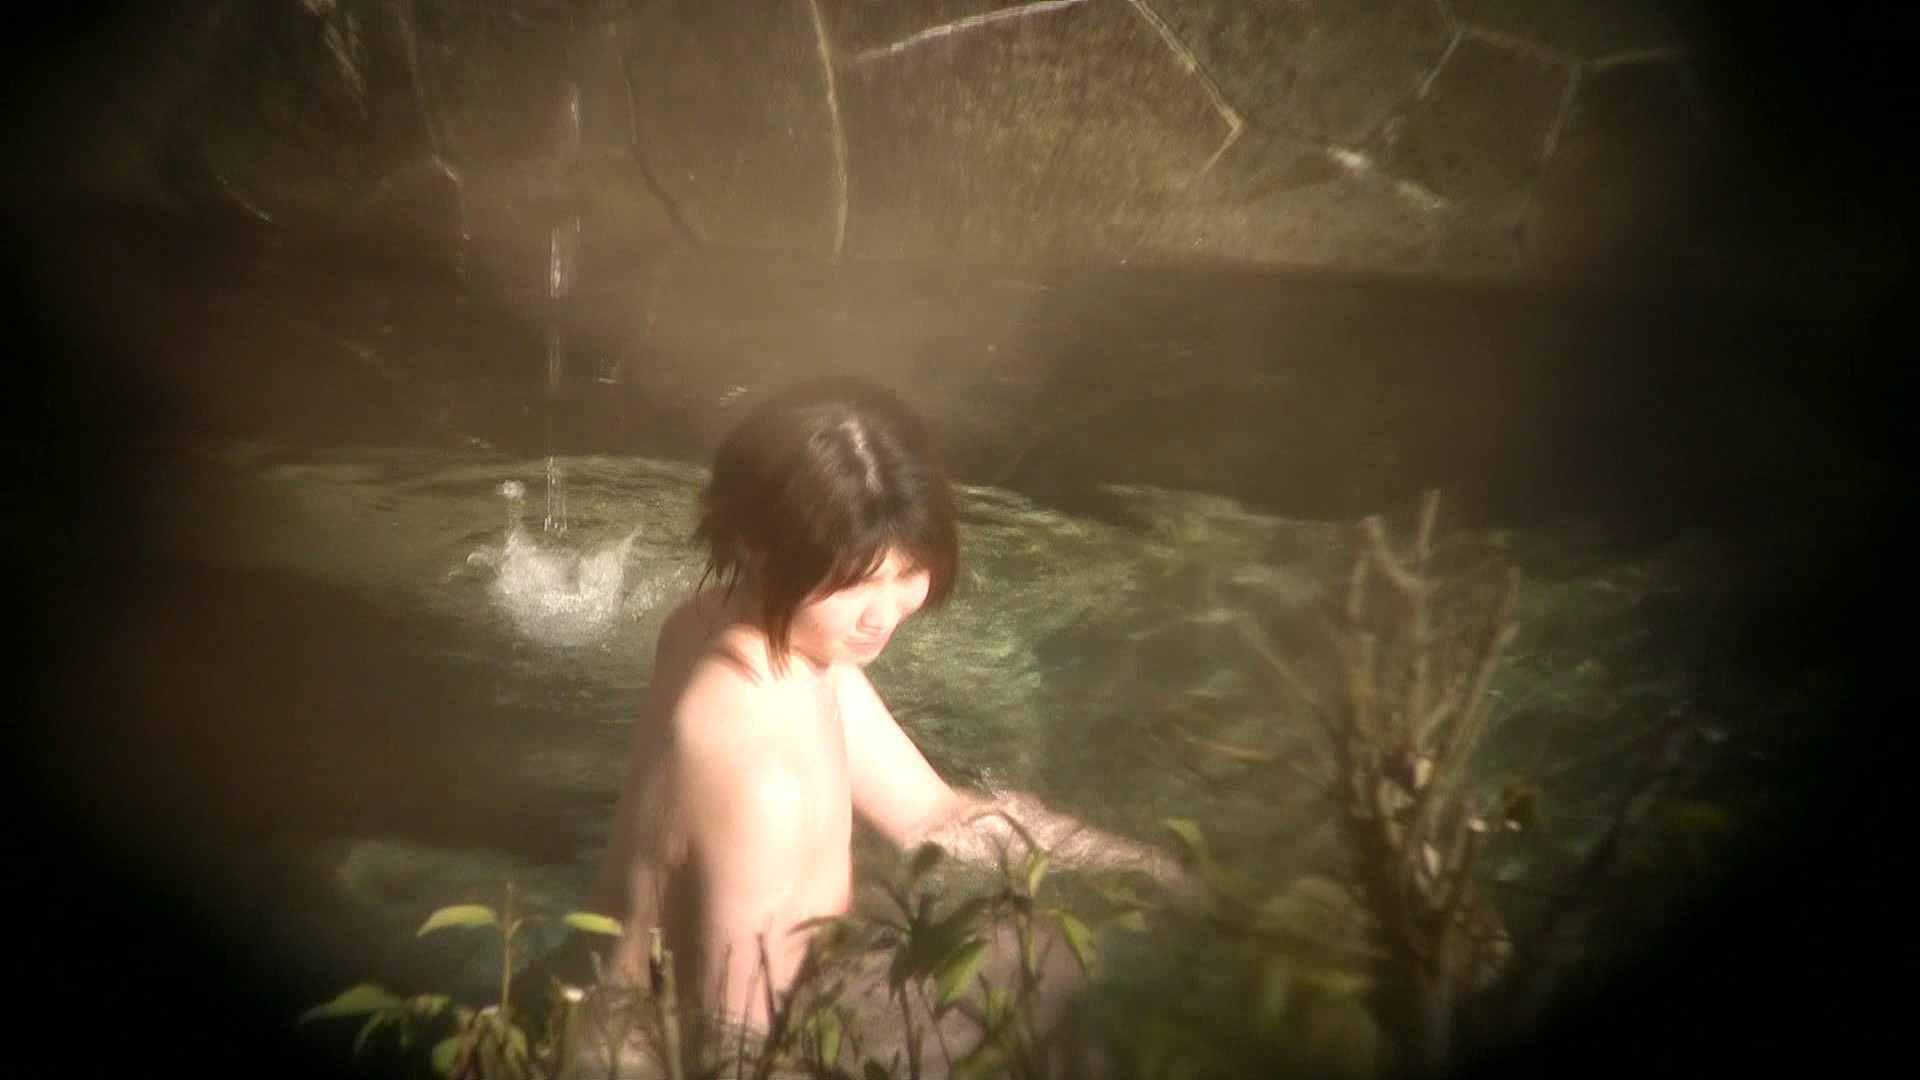 Aquaな露天風呂Vol.698 盗撮 | HなOL  86pic 74